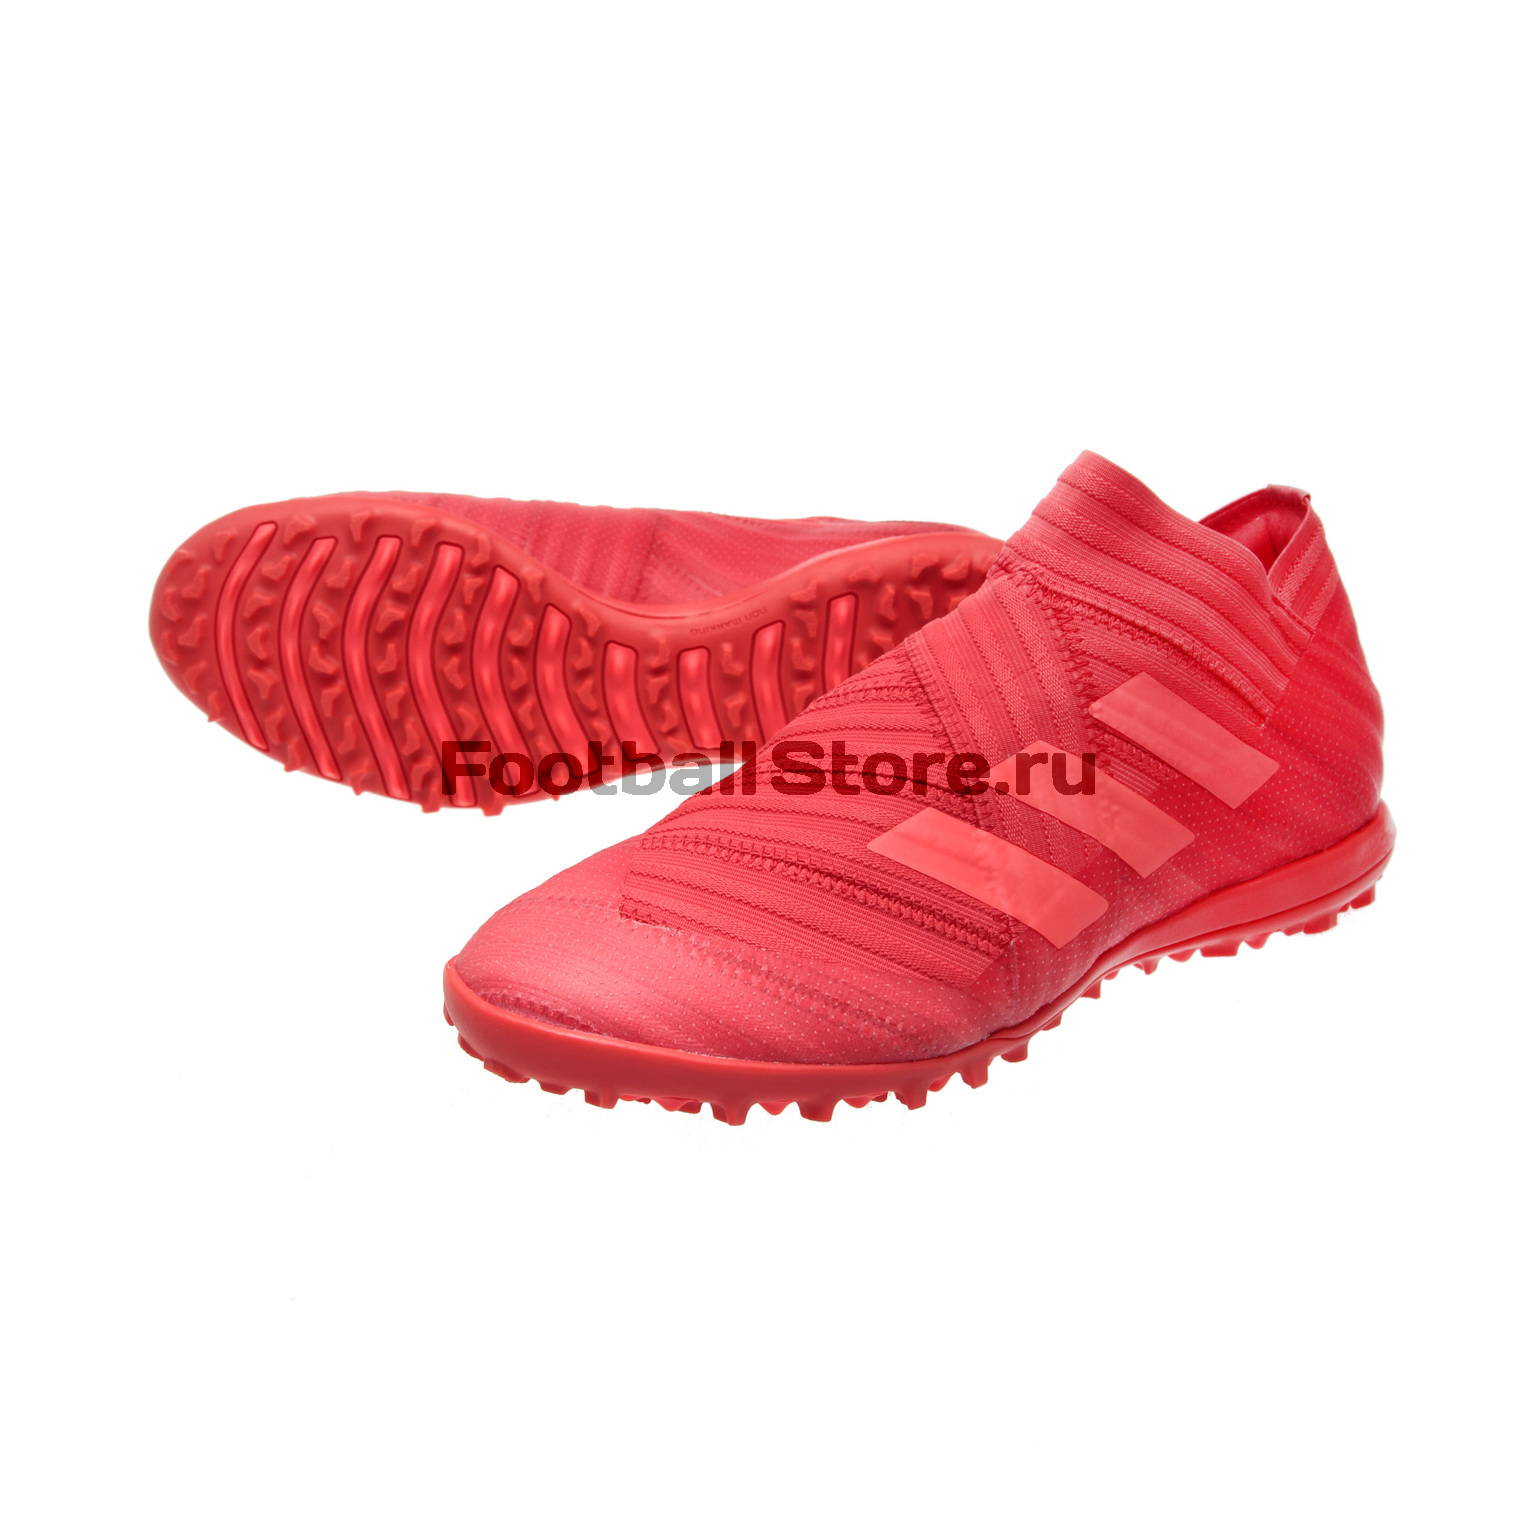 Шиповки Adidas Nemeziz Tango 17+ TF CP9093 термопот gemlux gl wb 200s